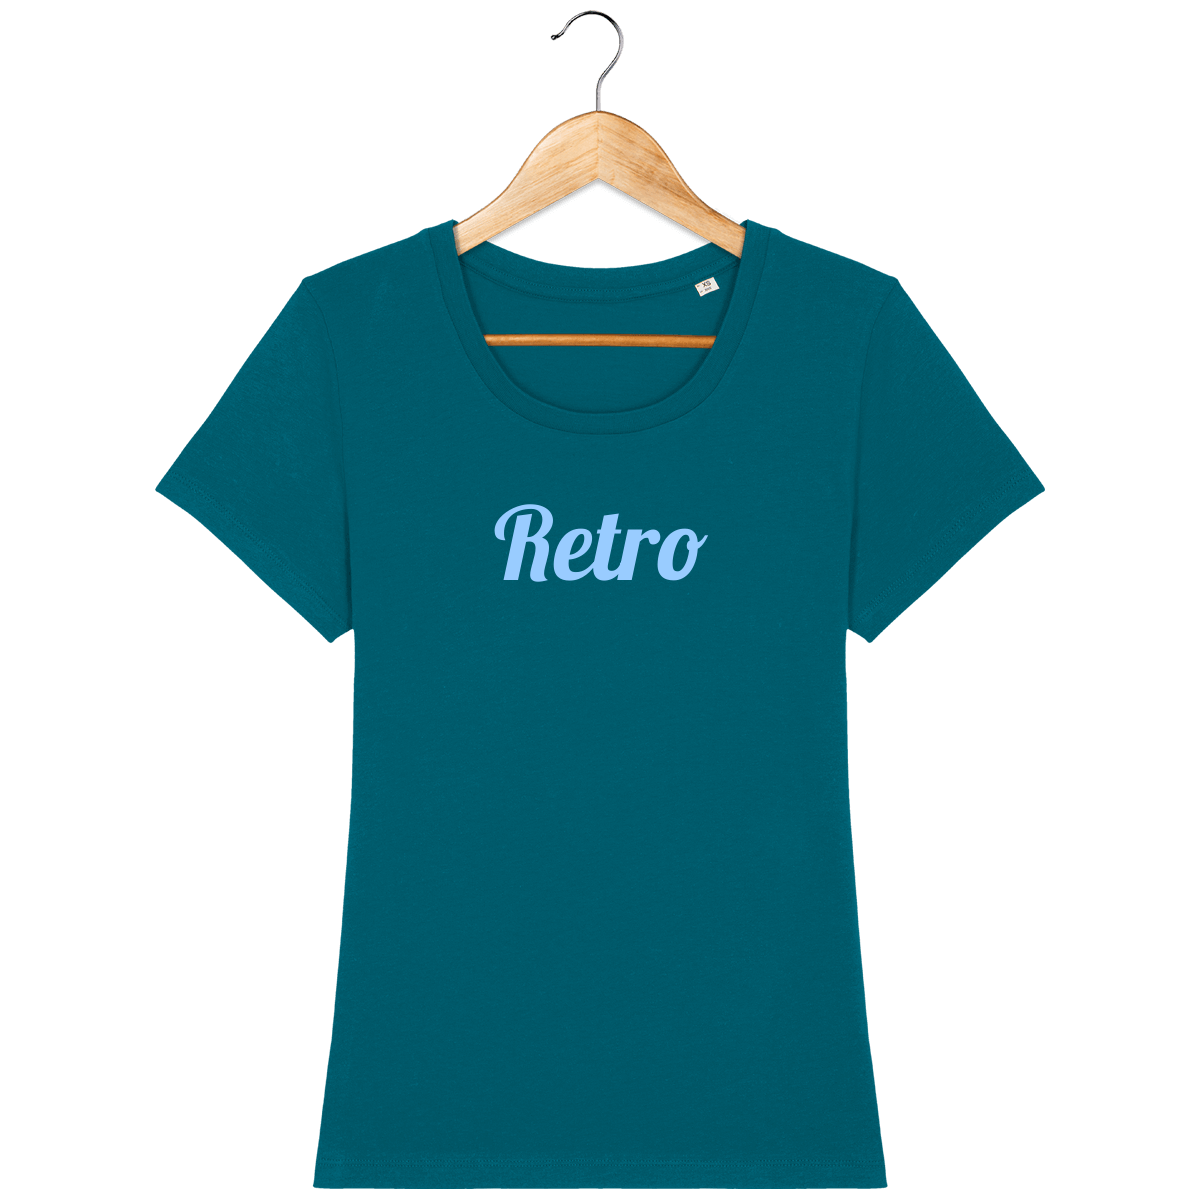 tshirt-bio-retro-heatherblackdenim-paleblue_ocean-depth_face